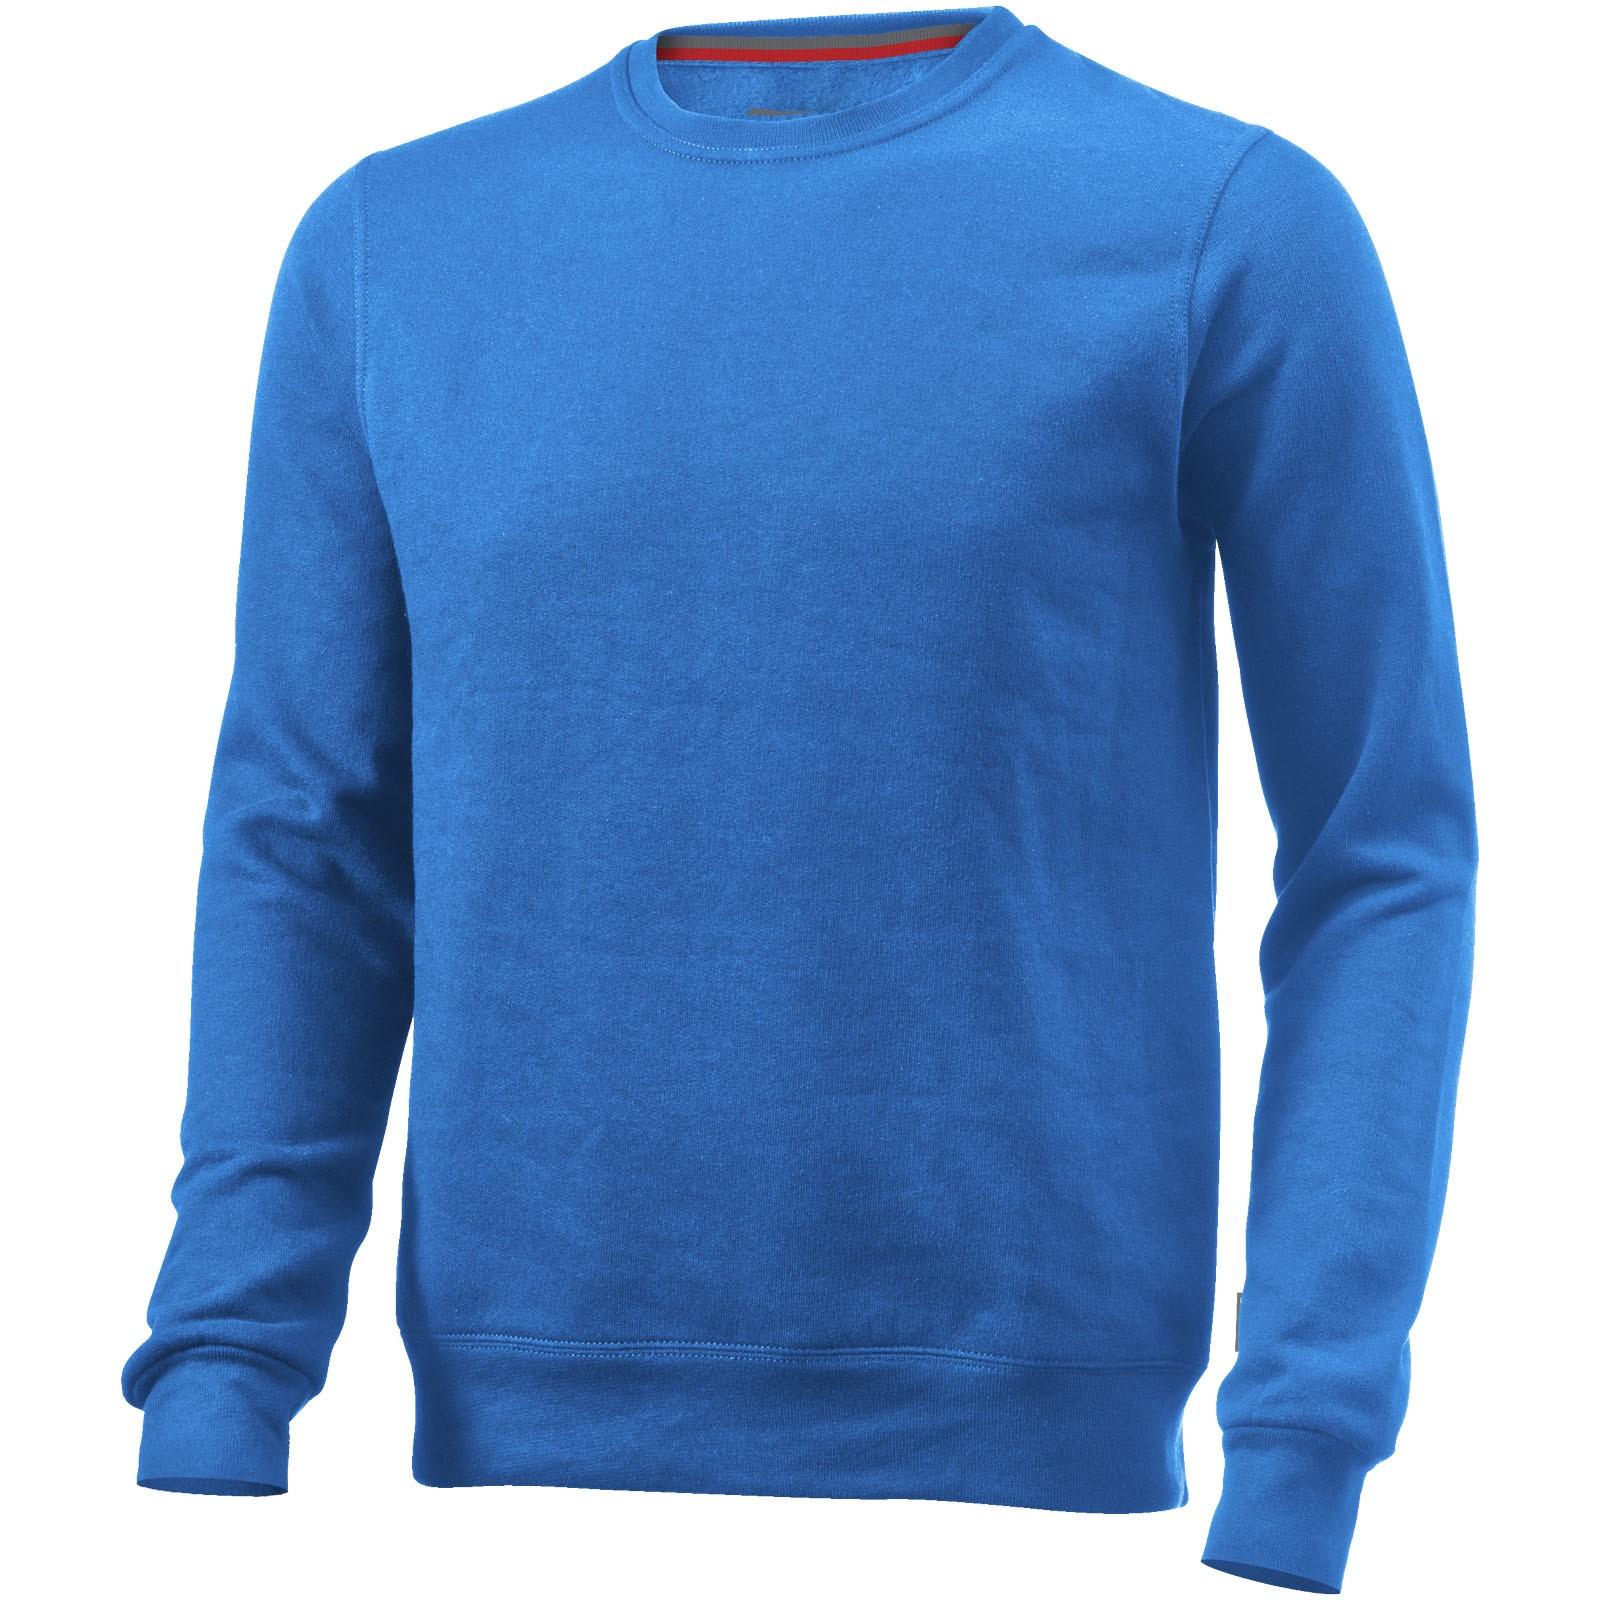 Toss crew neck sweater - Sky blue / S